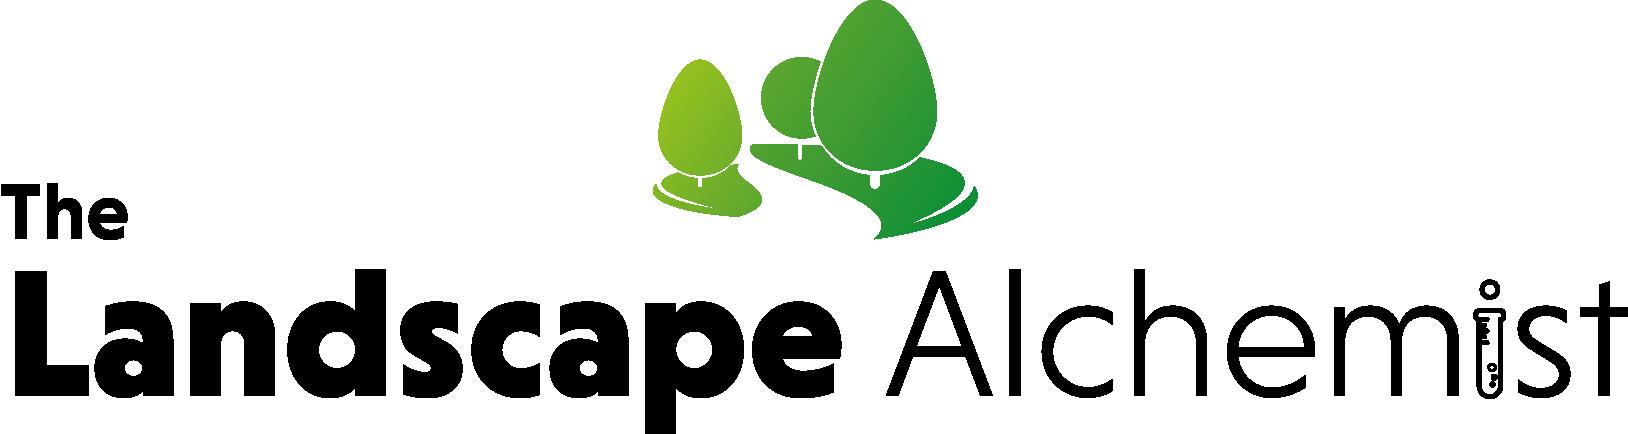 The landscape alchemist logo